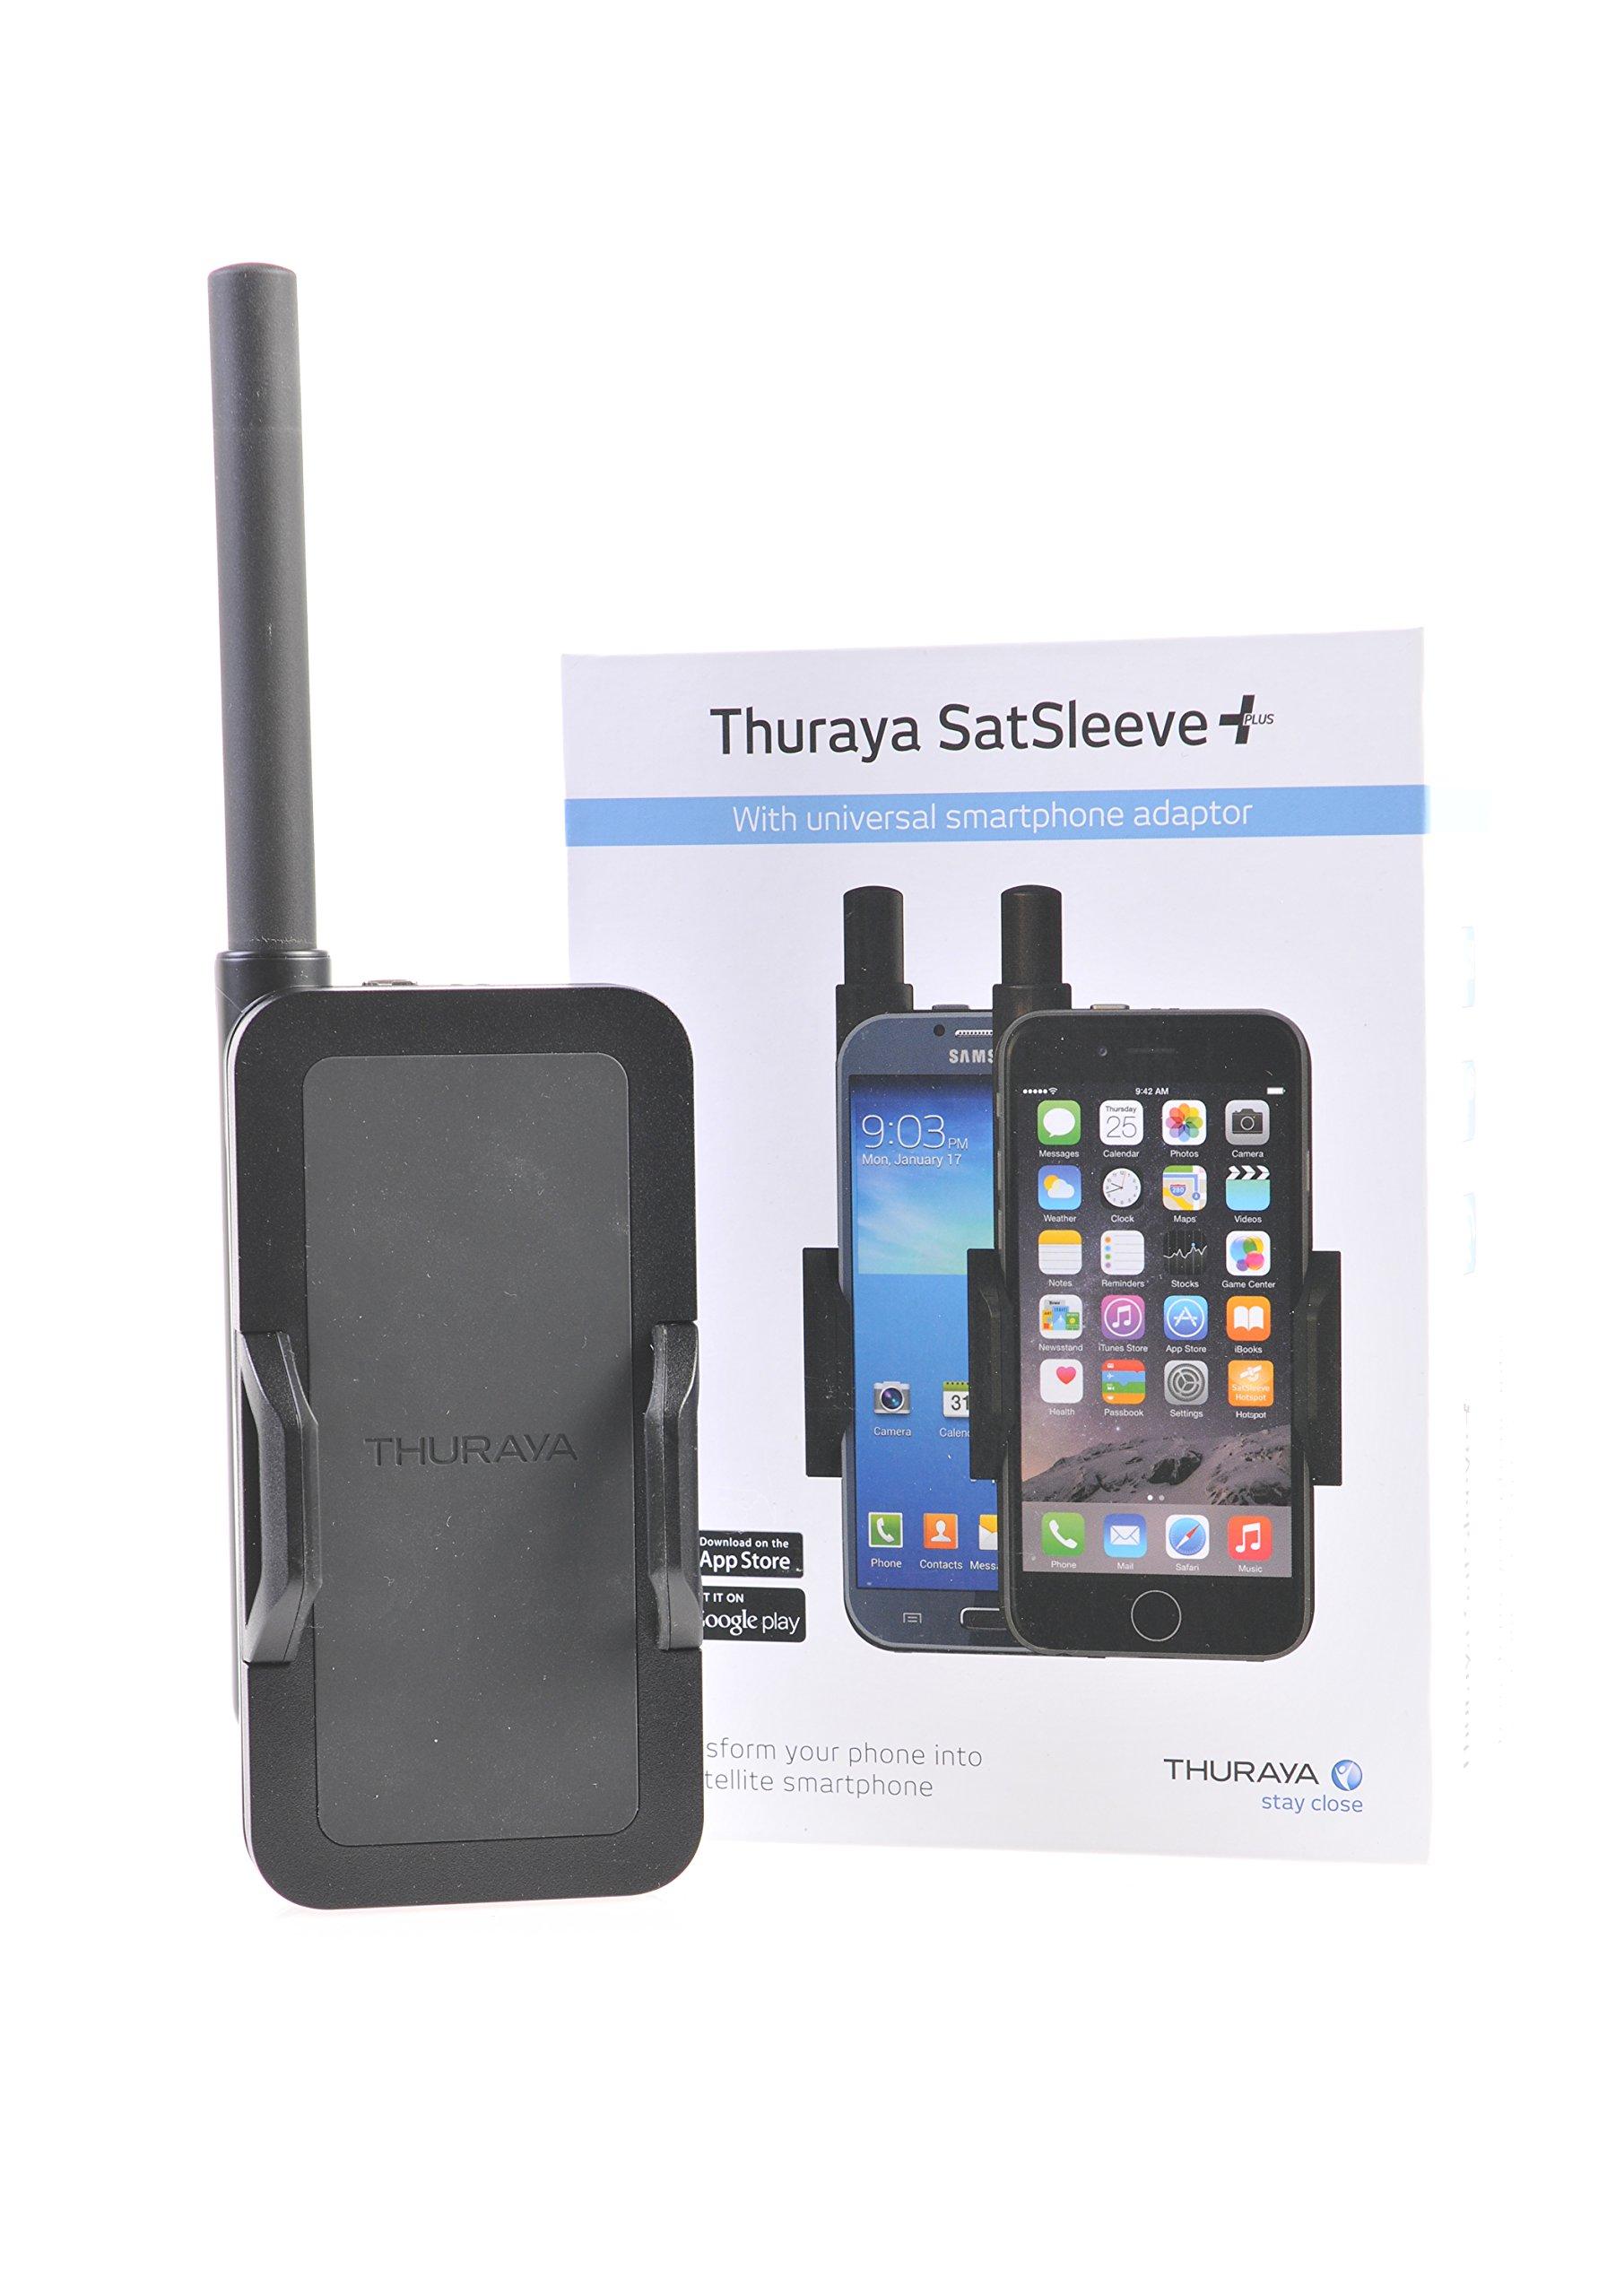 Thuraya satellite Satsleeve + (Plus) for Smartphones iPhone Android by Thuraya